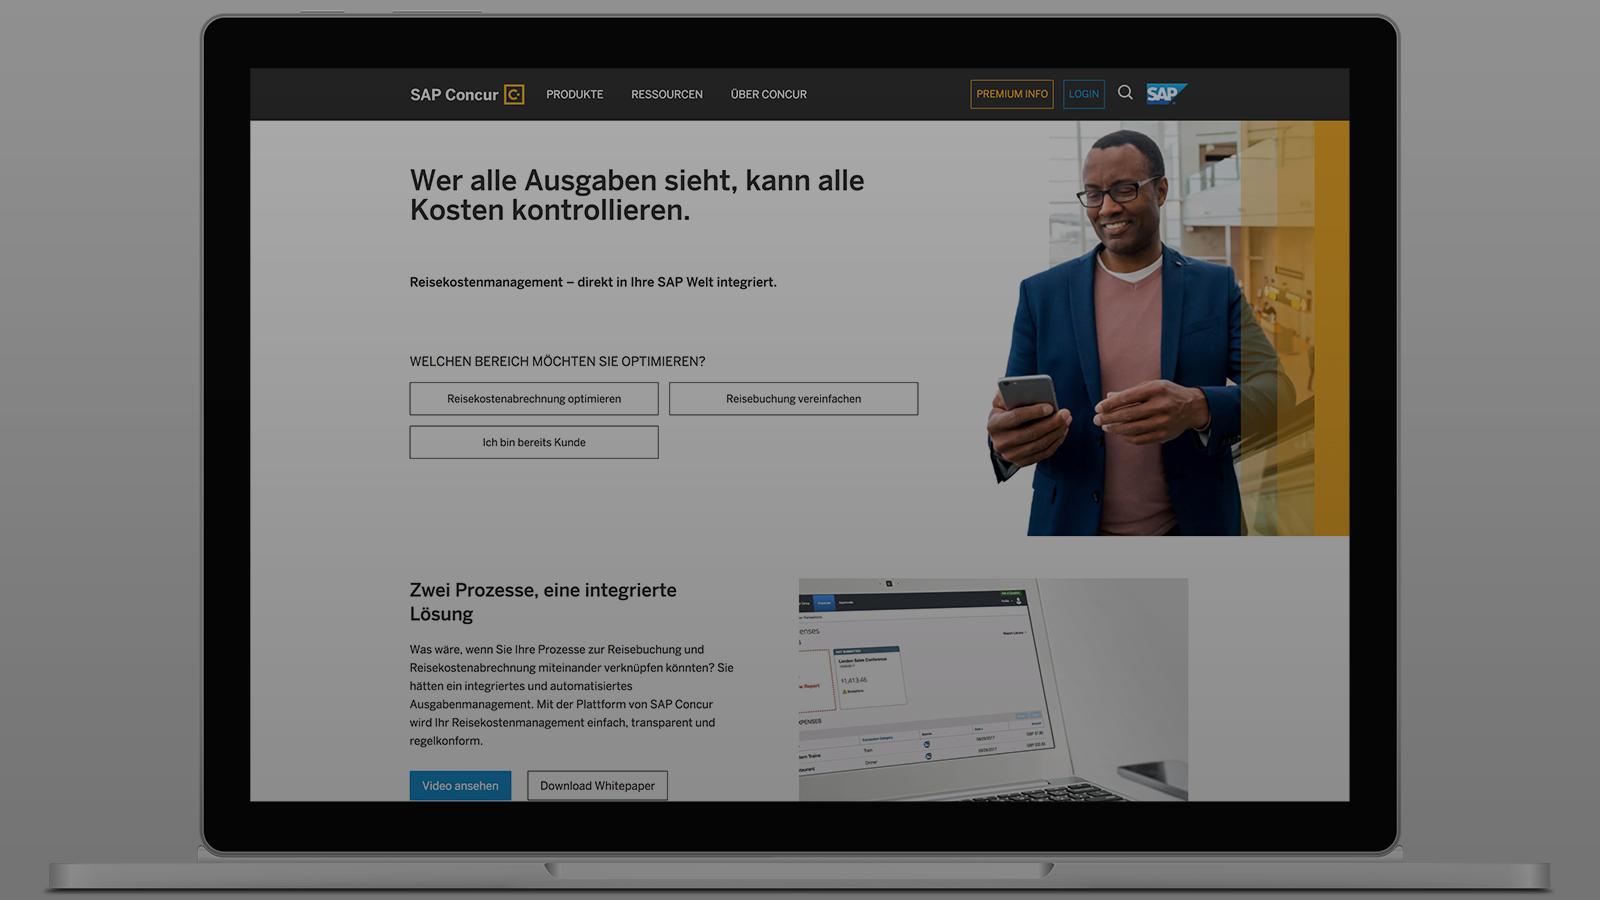 SAP/CONCUR - Global Marketing